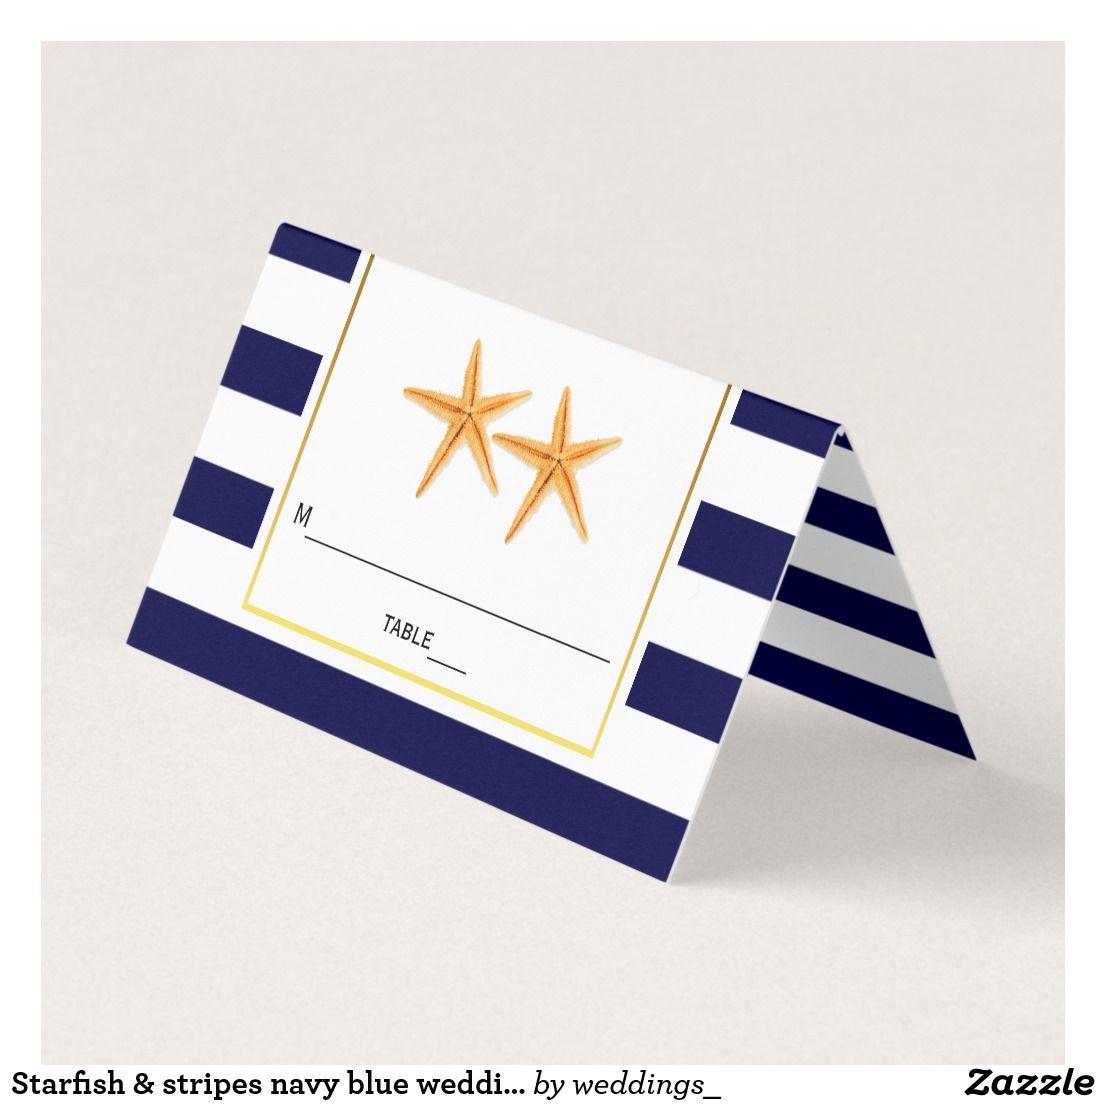 Yellow wedding decorations ideas november 2018 Starfish u stripes navy blue wedding folded escort place card  Nick